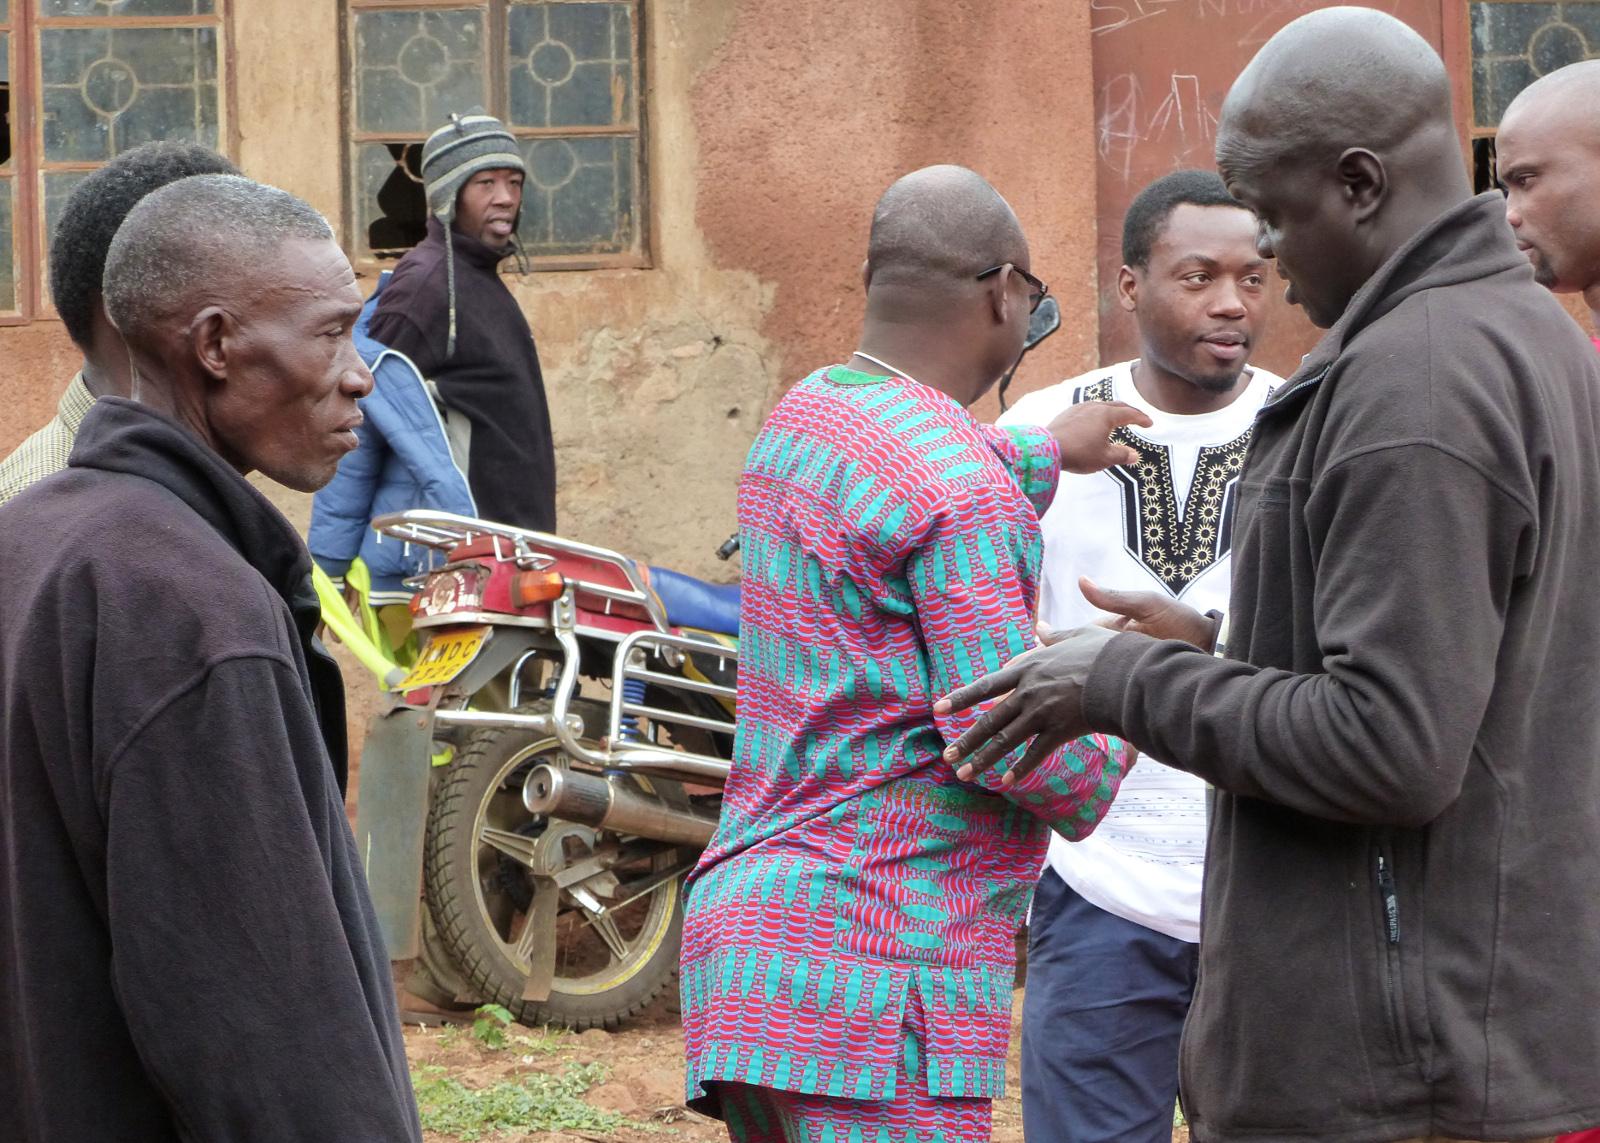 Kenyan deaf population rises, cause unclear